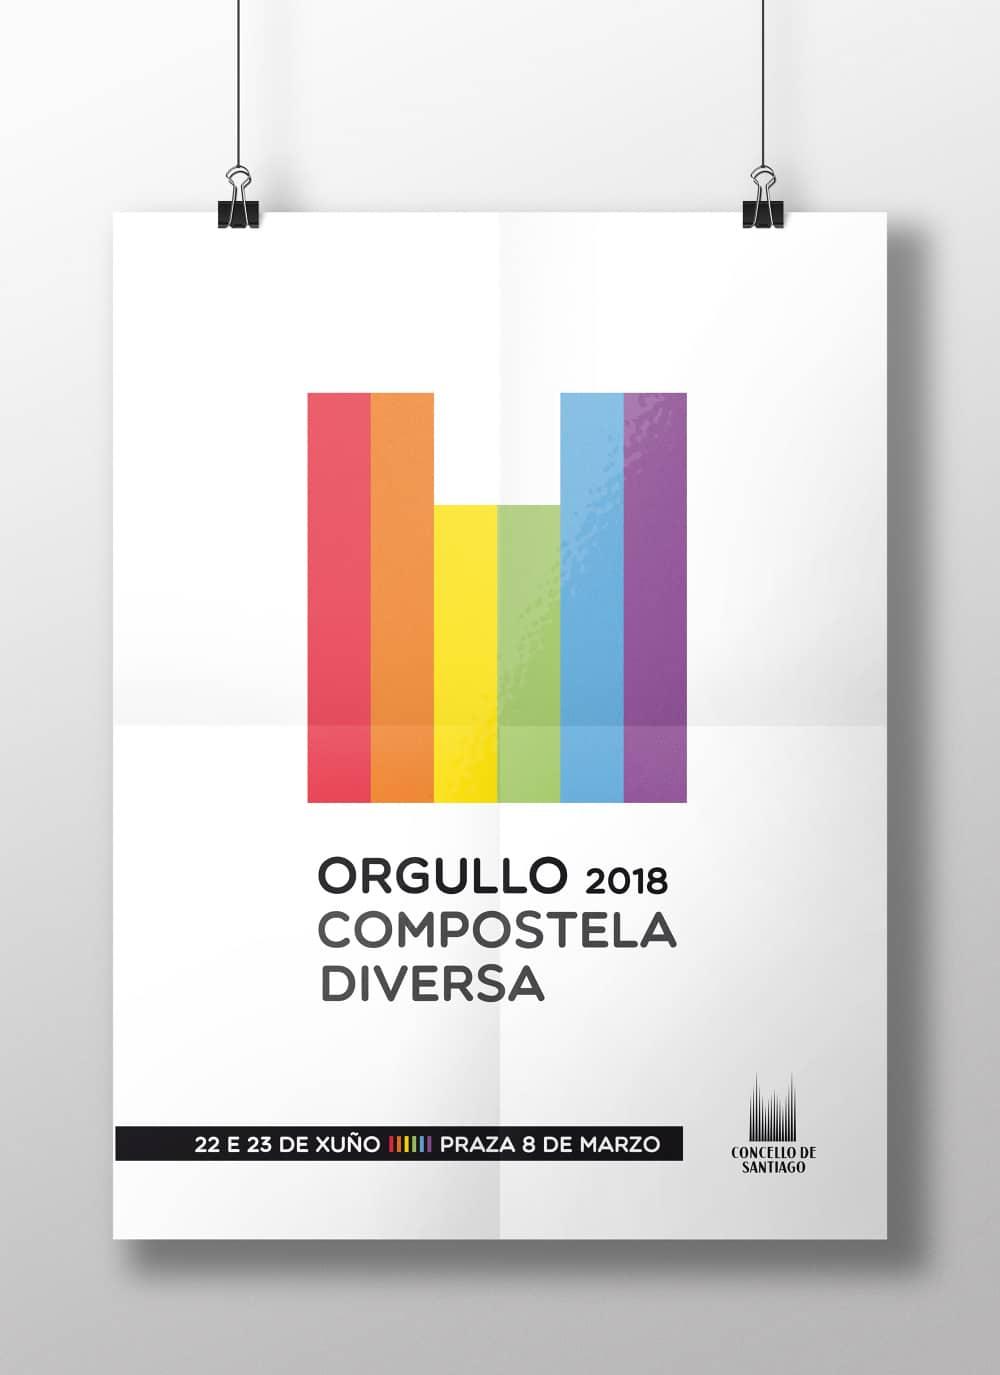 1_orgullo_compostela diversa poster